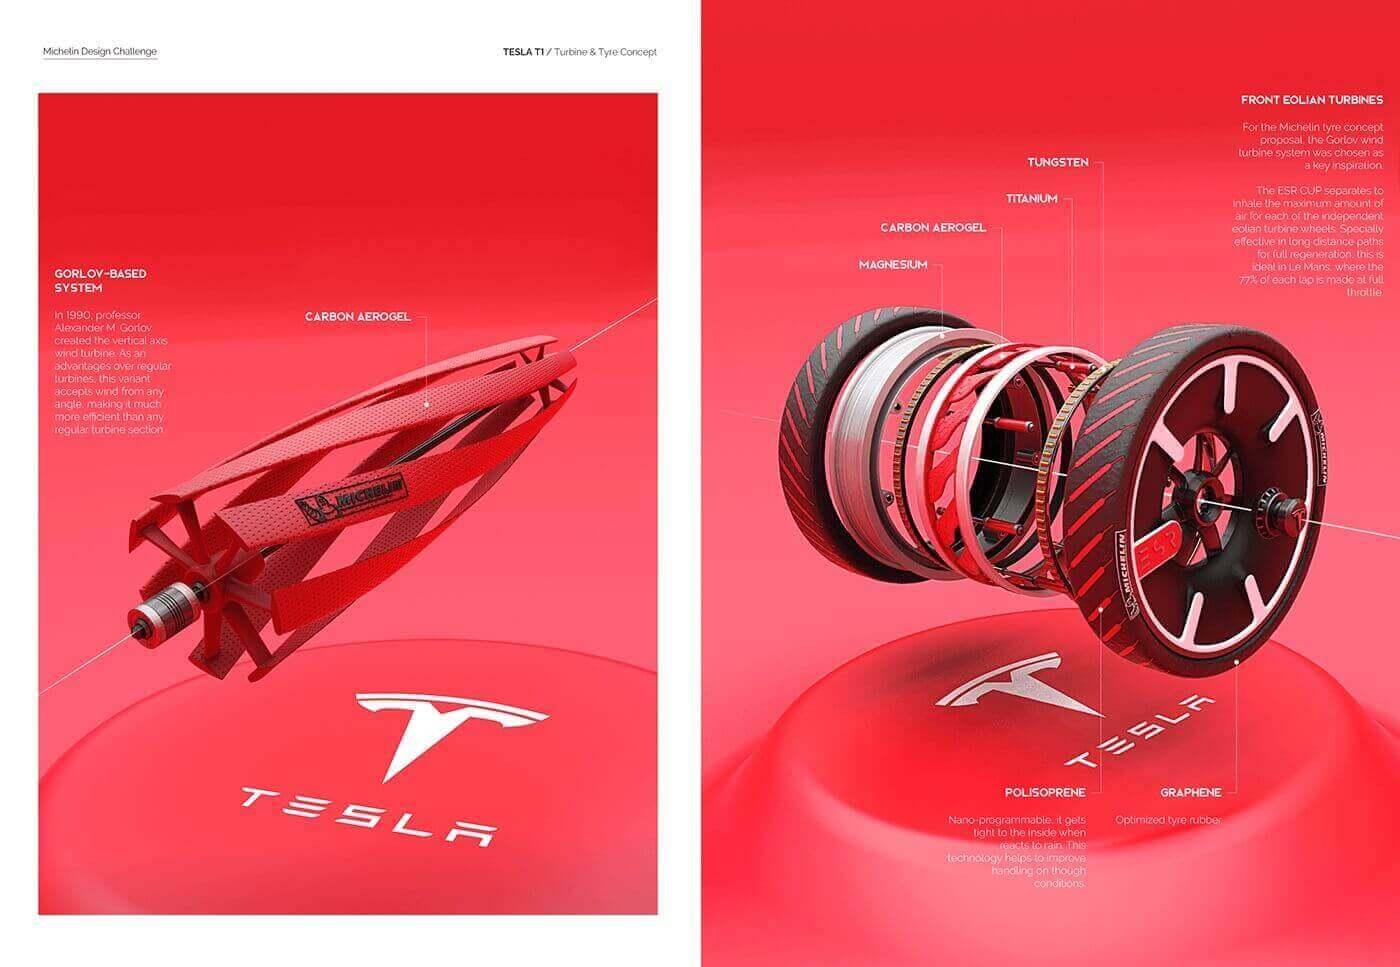 Проект концепт Тесла Т1 для Мишлен